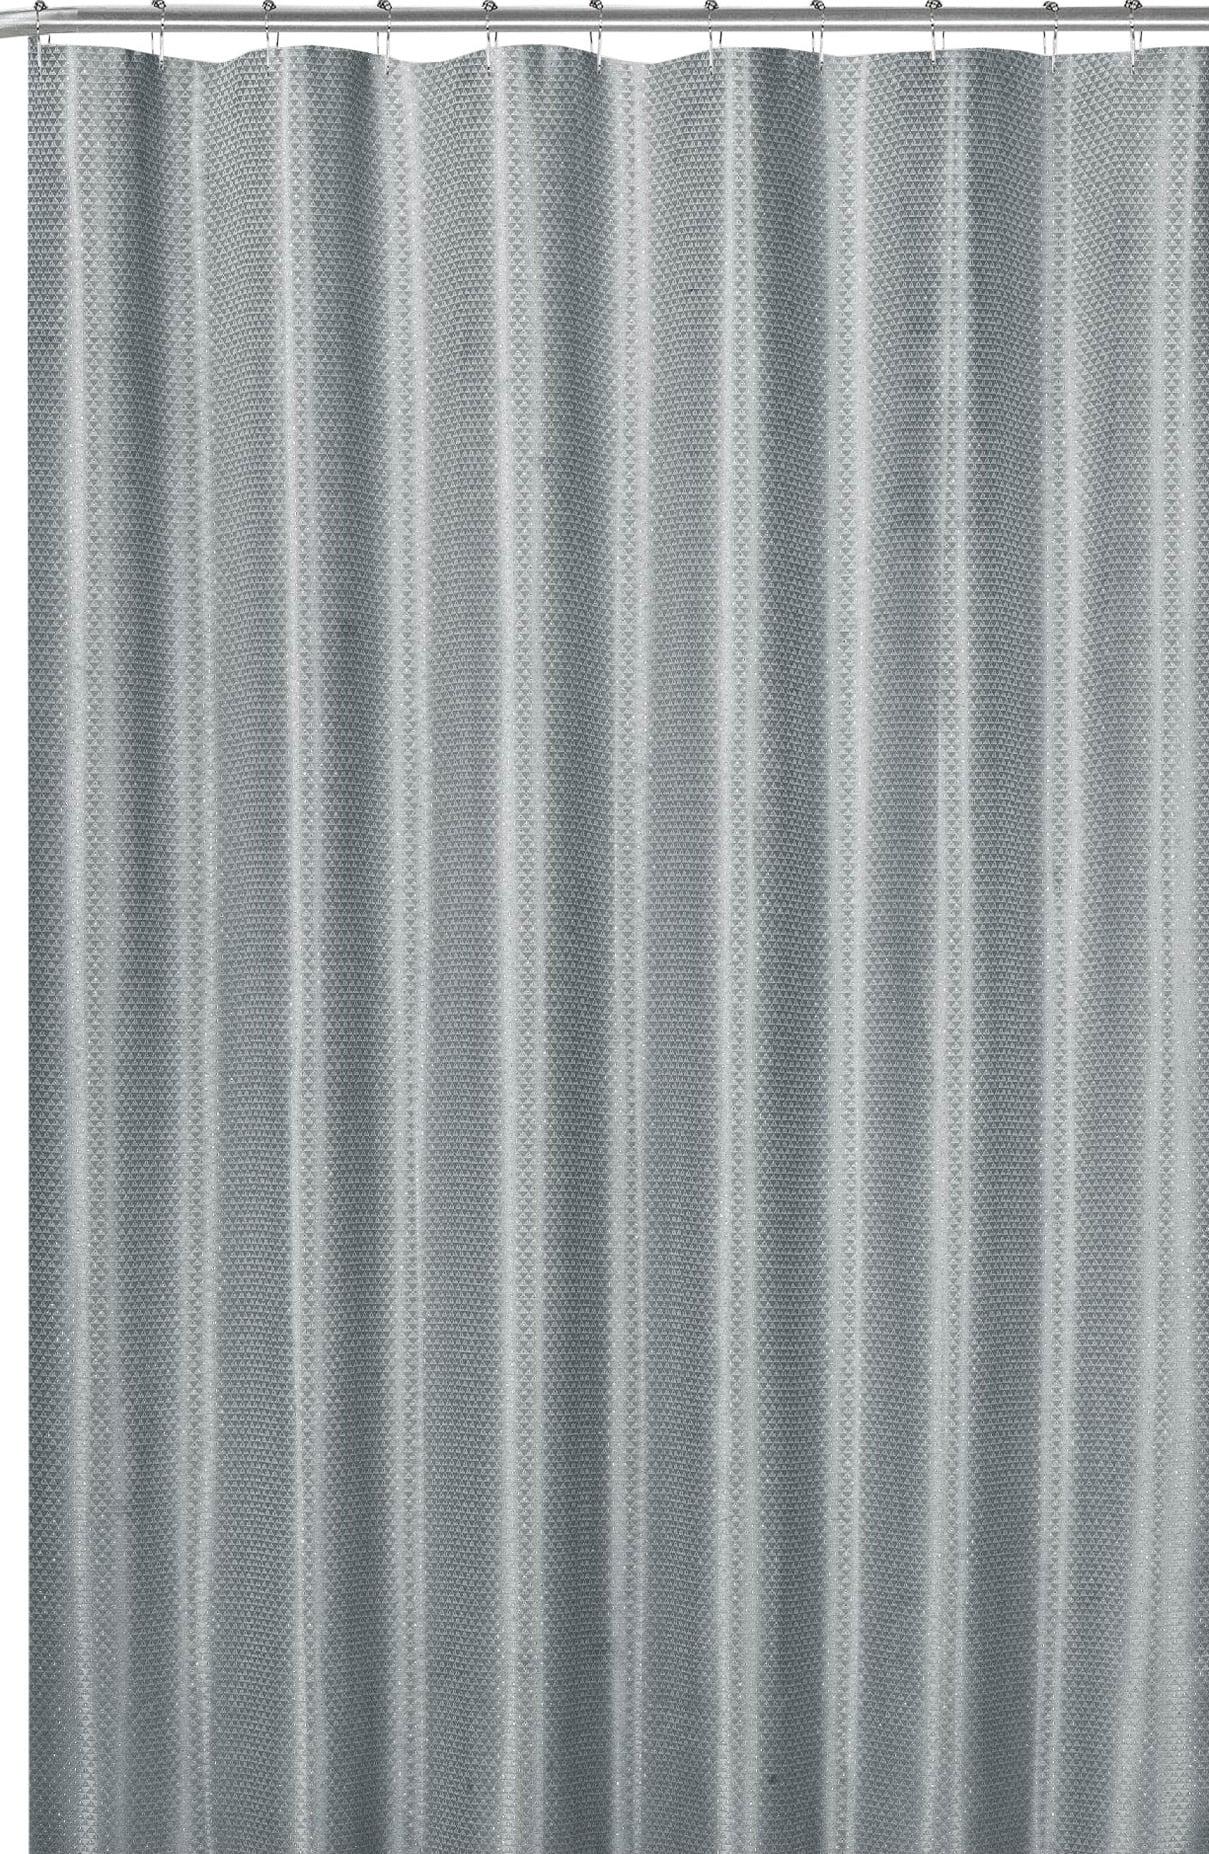 gray fabric shower curtain modern geometric with silver metallic accent walmart com